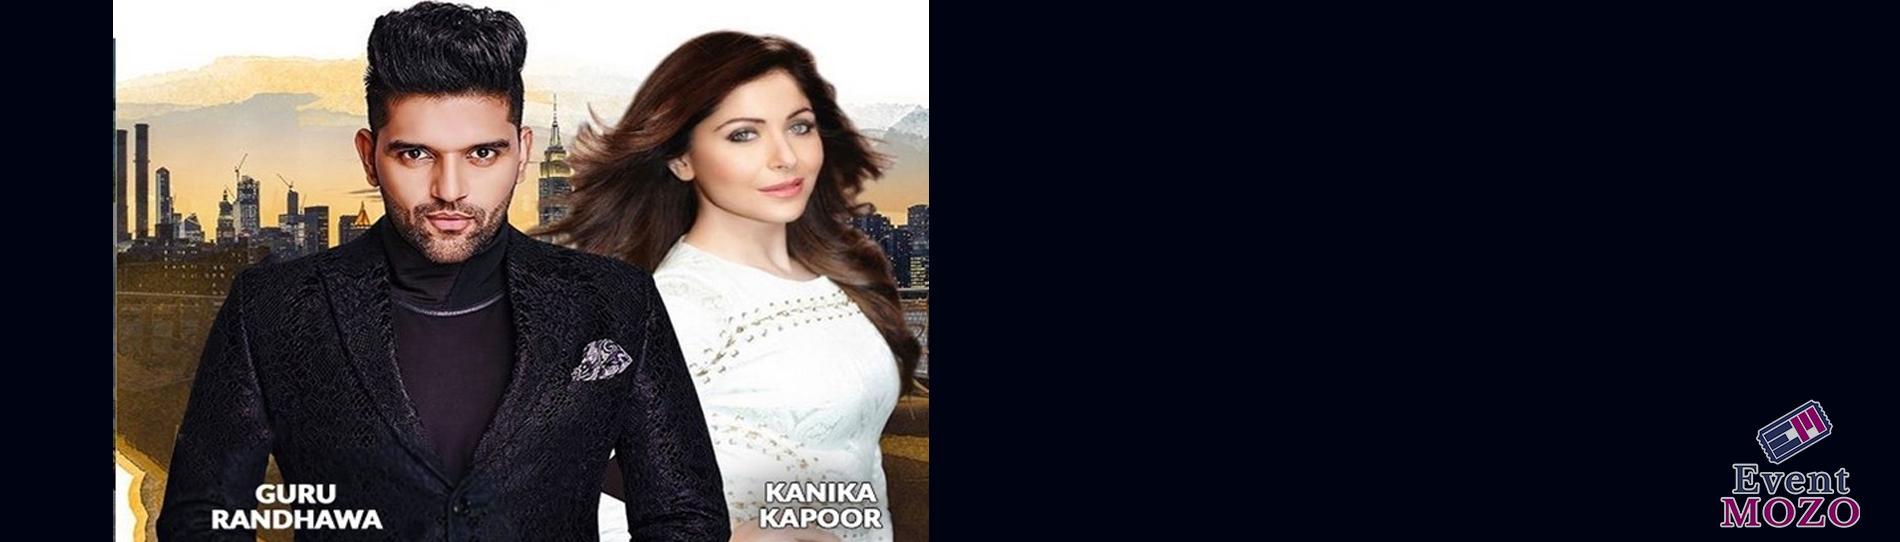 Guru Randhawa and Kanika Kapoor Live In Concert - Bay Area